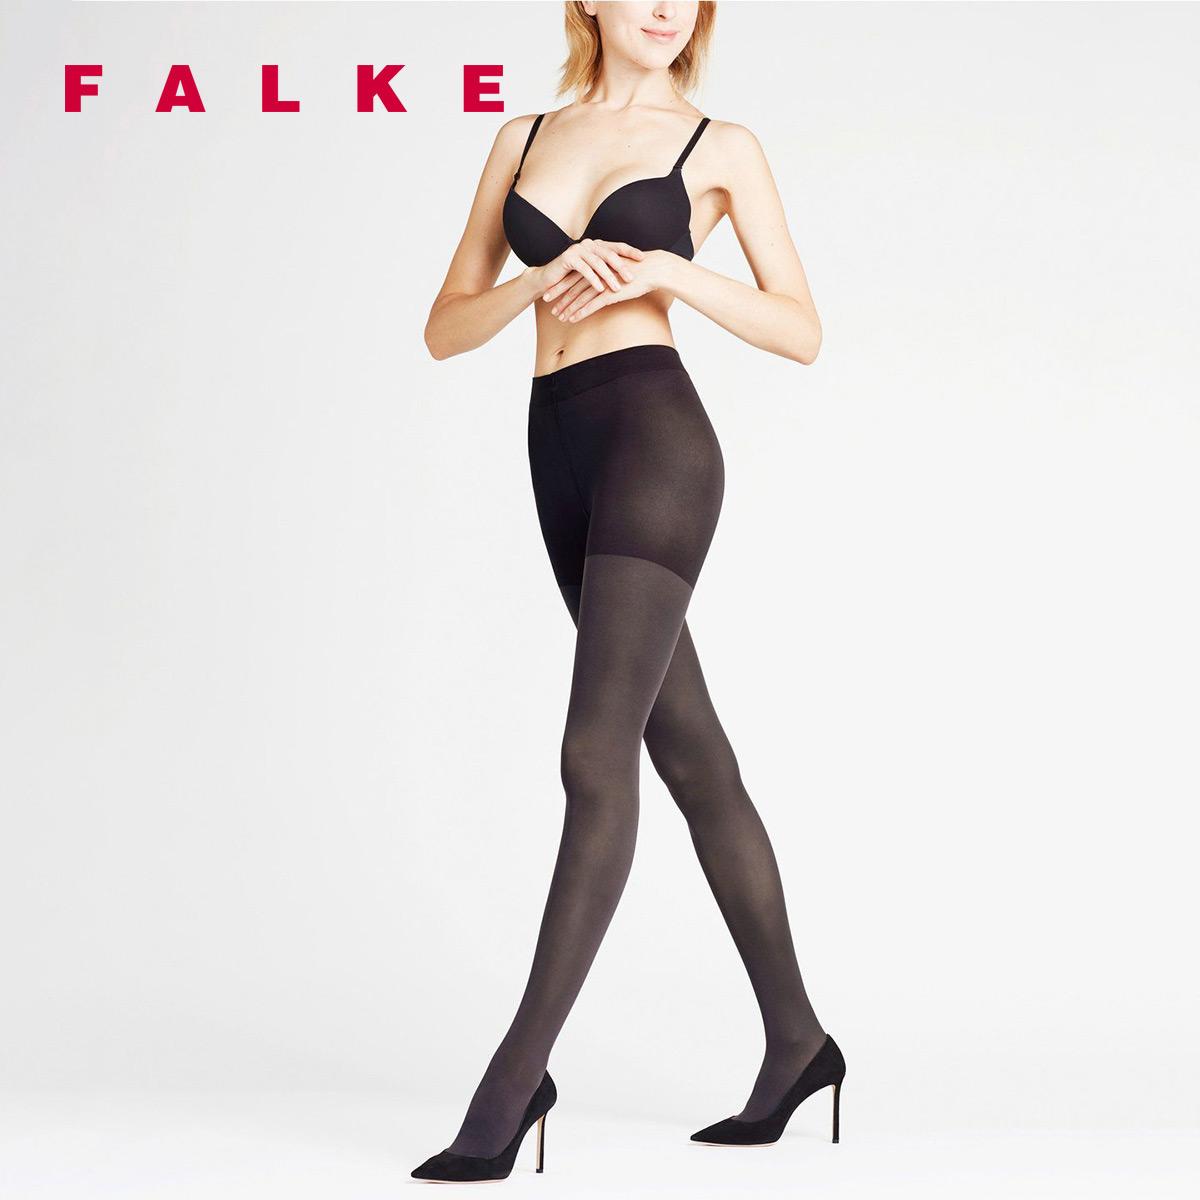 FALKE德国鹰客Leg Energizer 50D厚半透明哑光连裤袜丝袜女40585